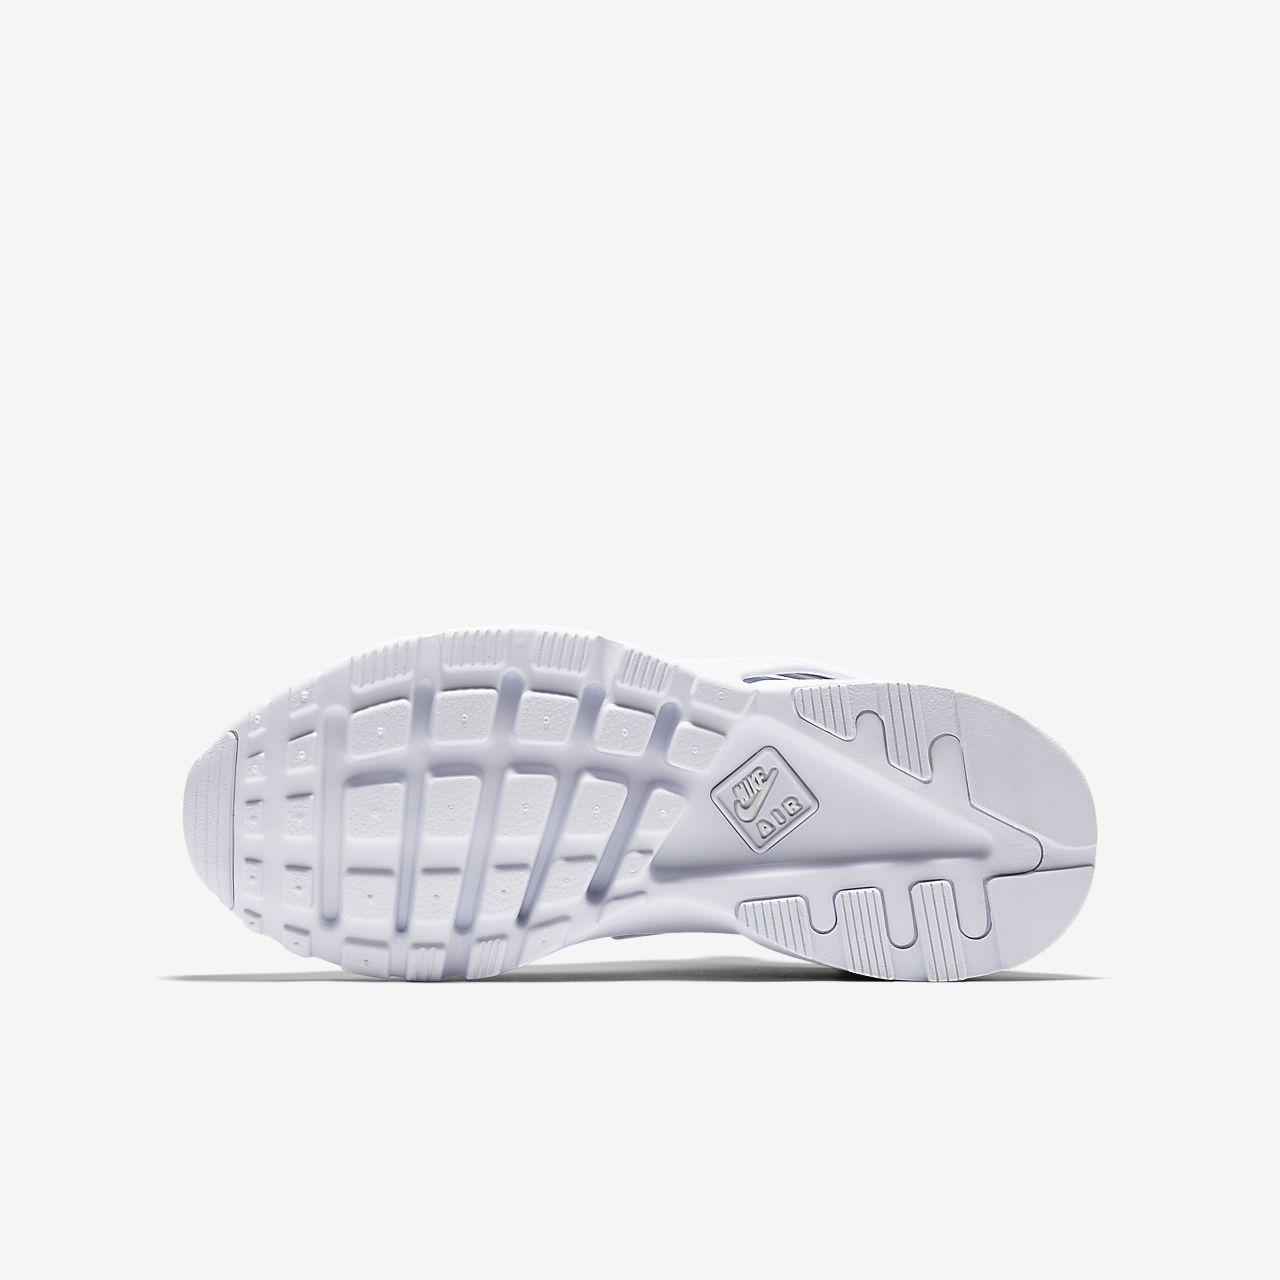 Nike Air Huarache Ultra Schuh für ältere Kinder